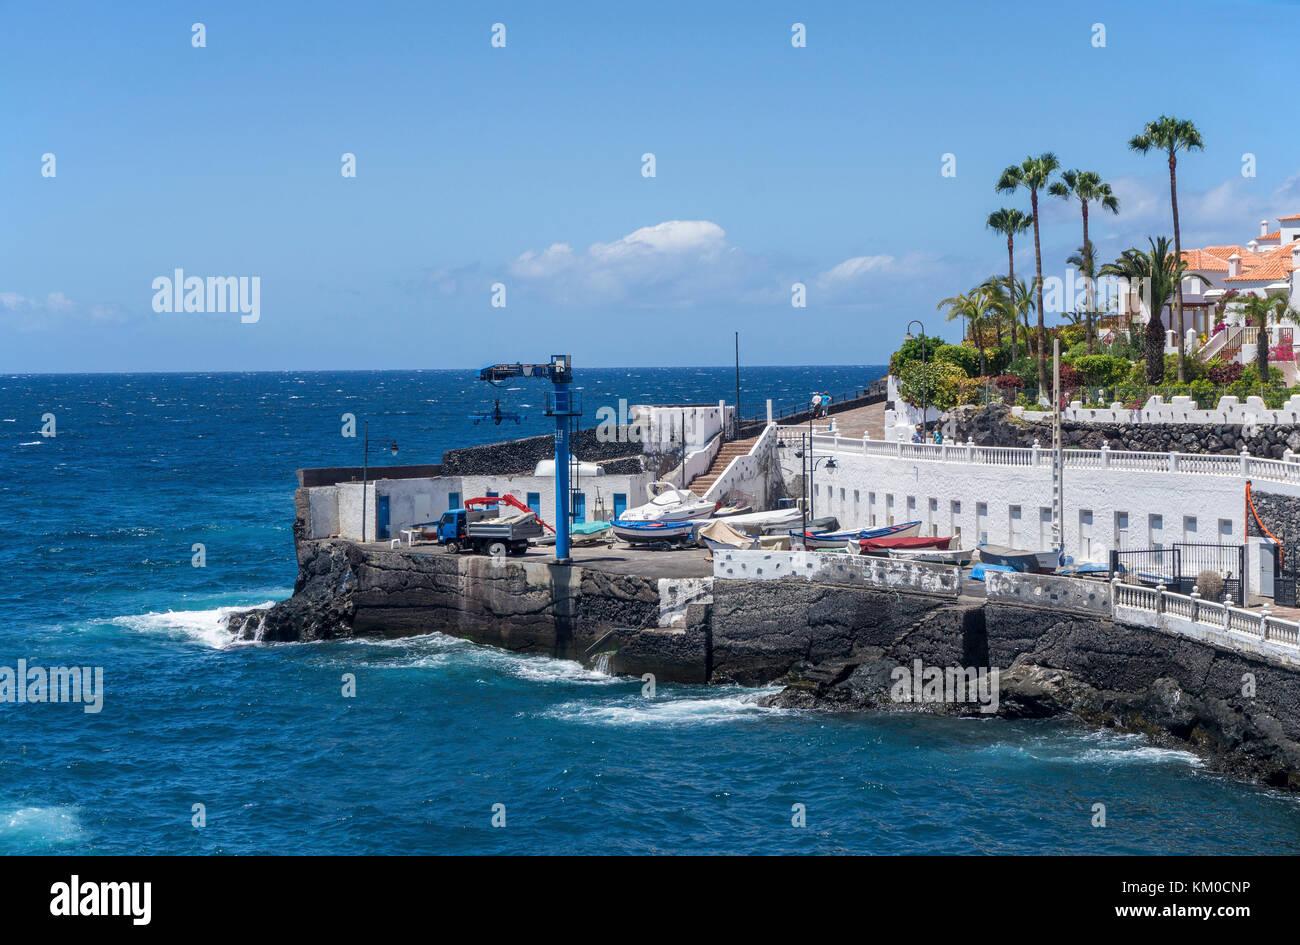 Piscina los chocos, tiny fishing harbour at village Puerto de Santiago, west coast of Tenerife island, Canary islands, - Stock Image